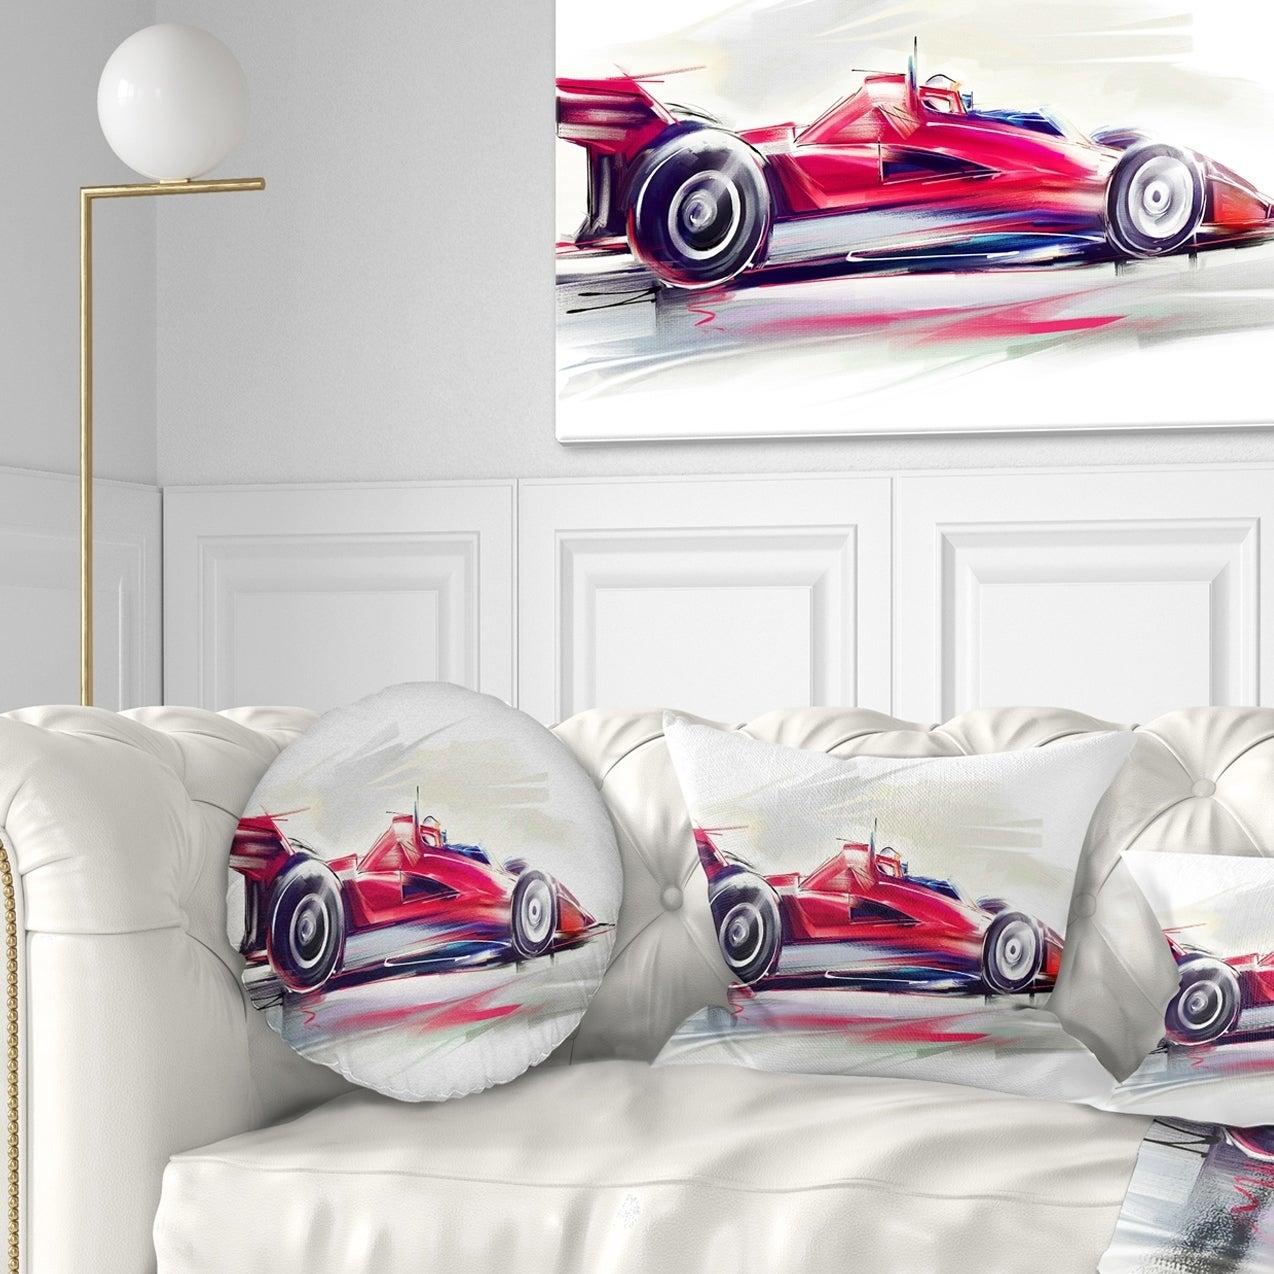 Designart Cu7319 12 20 Red Formula One Digital Art Car Lumbar Cushion Cover For Living Room Sofa Throw Pillow 12 X 20 Throw Pillow Covers Home Kitchen